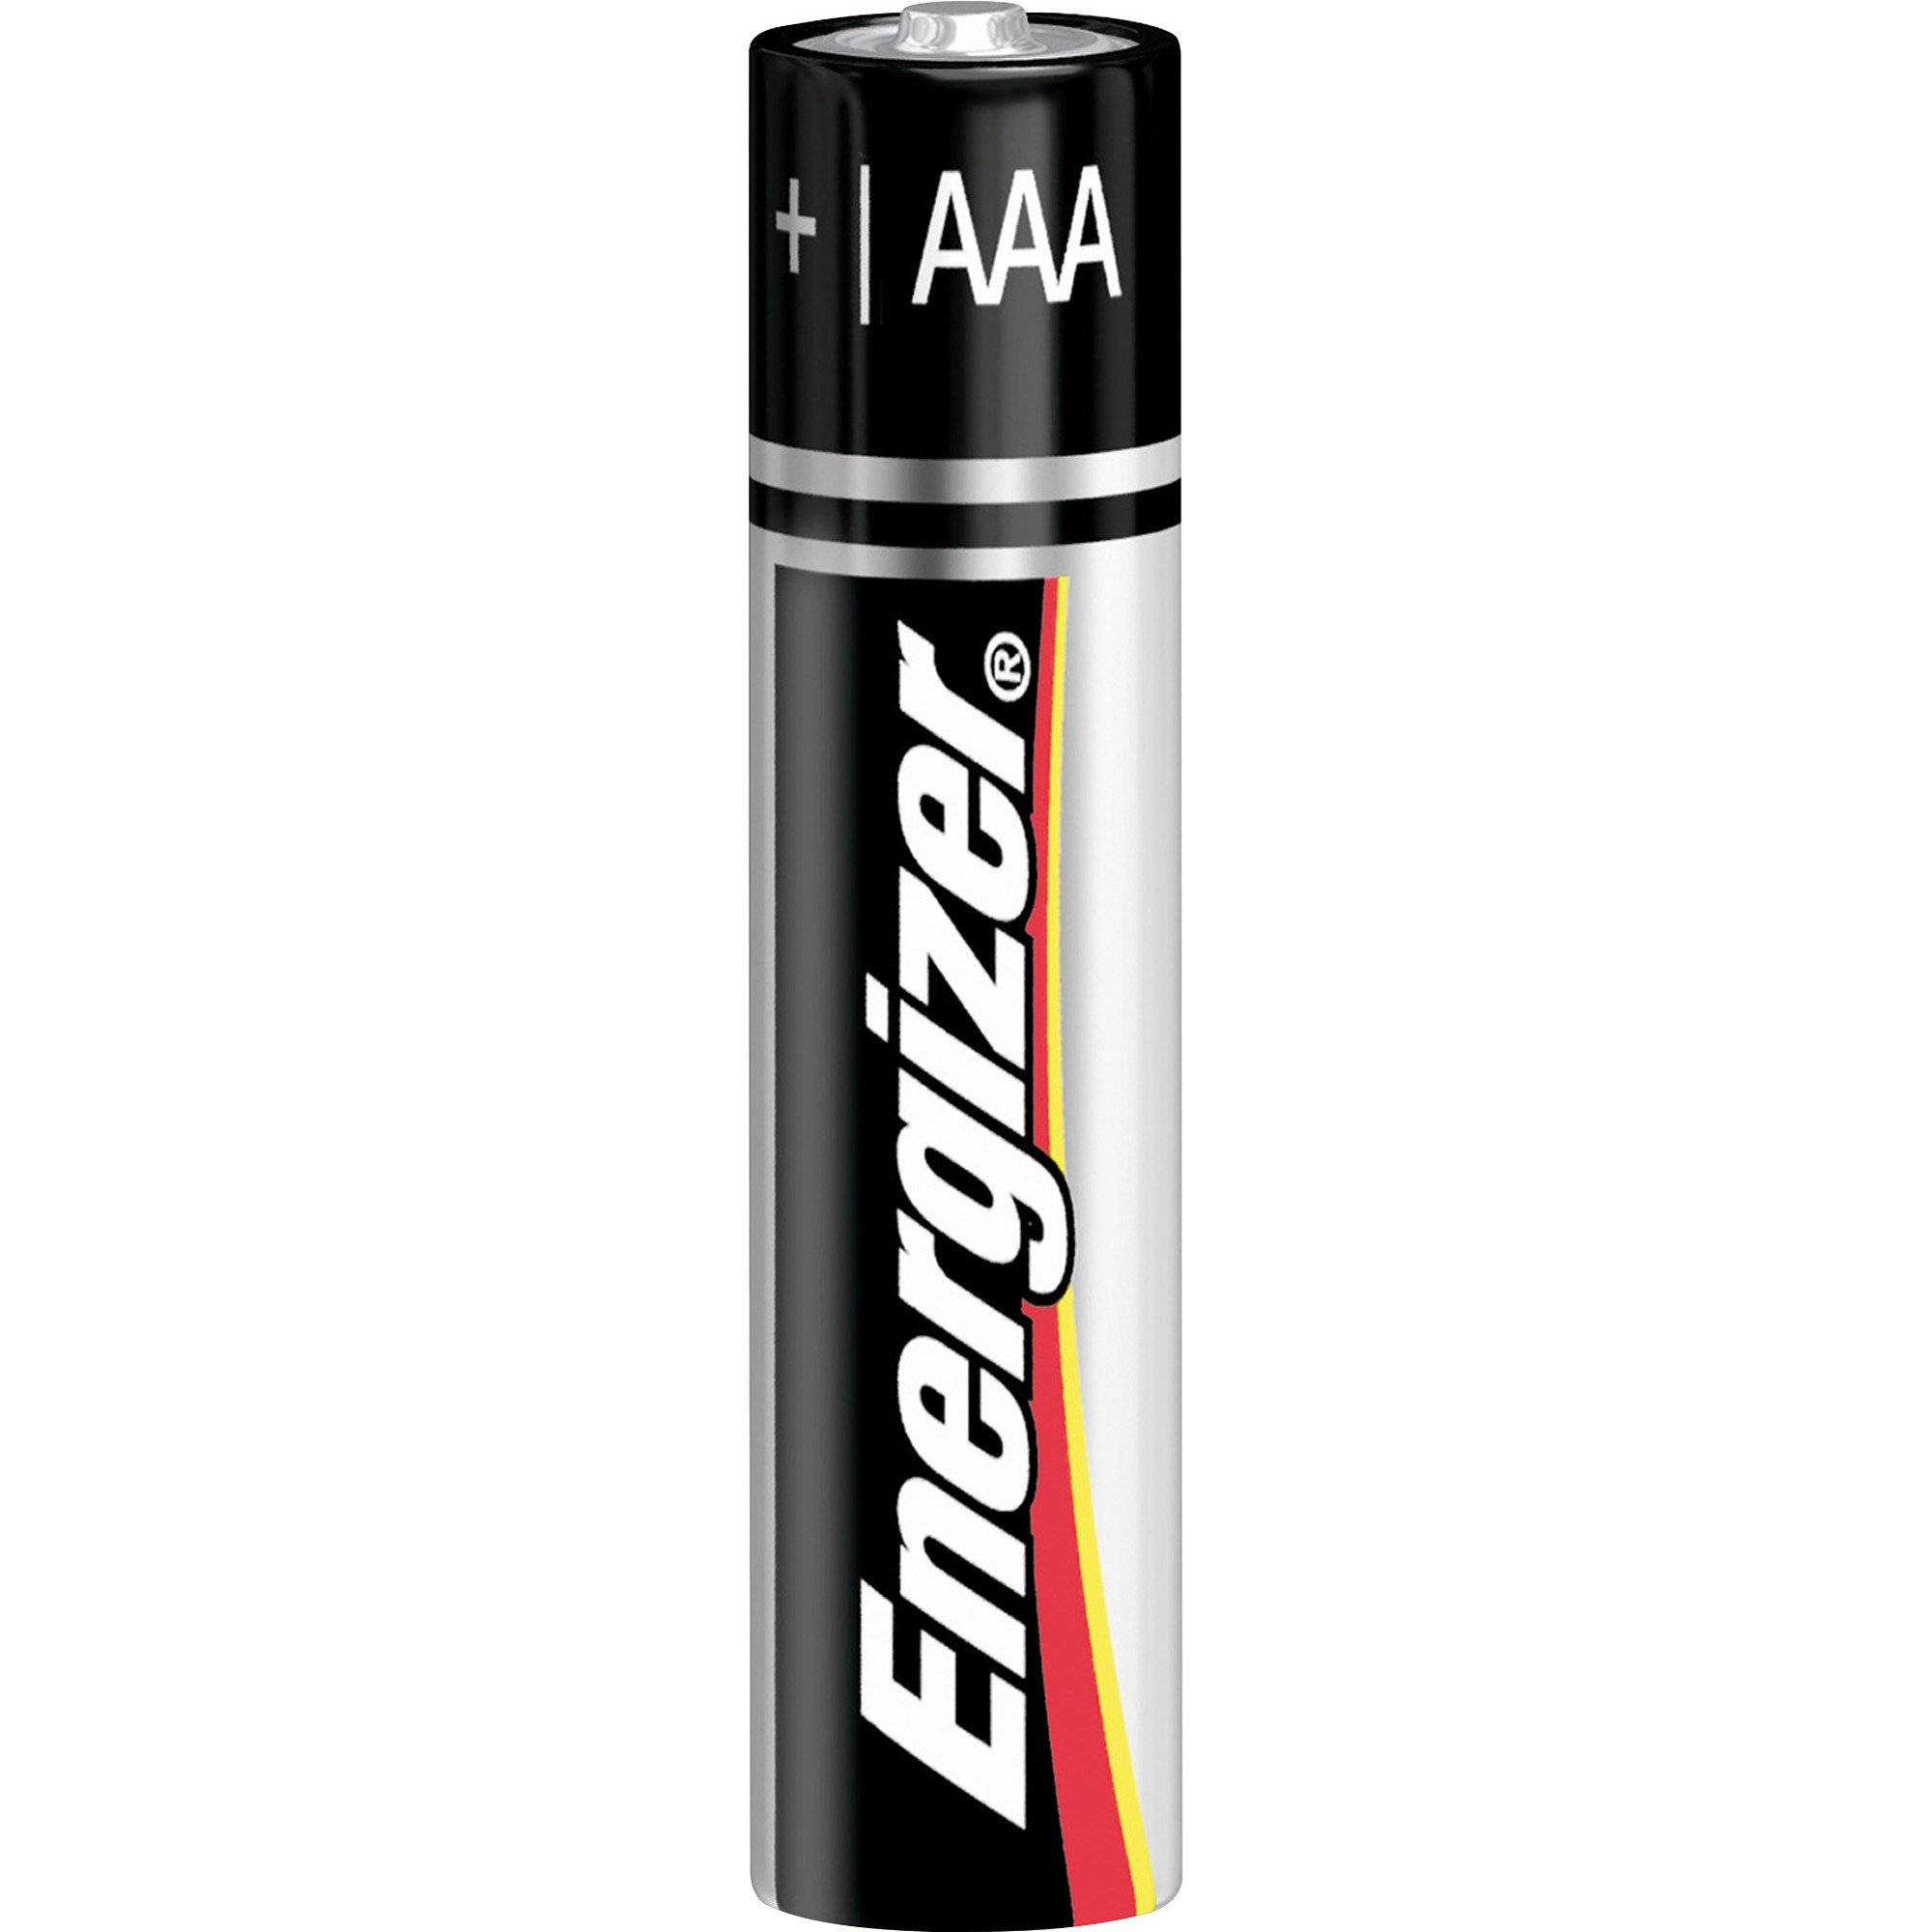 Energizer EVEE92 Alkaline General Purpose Battery